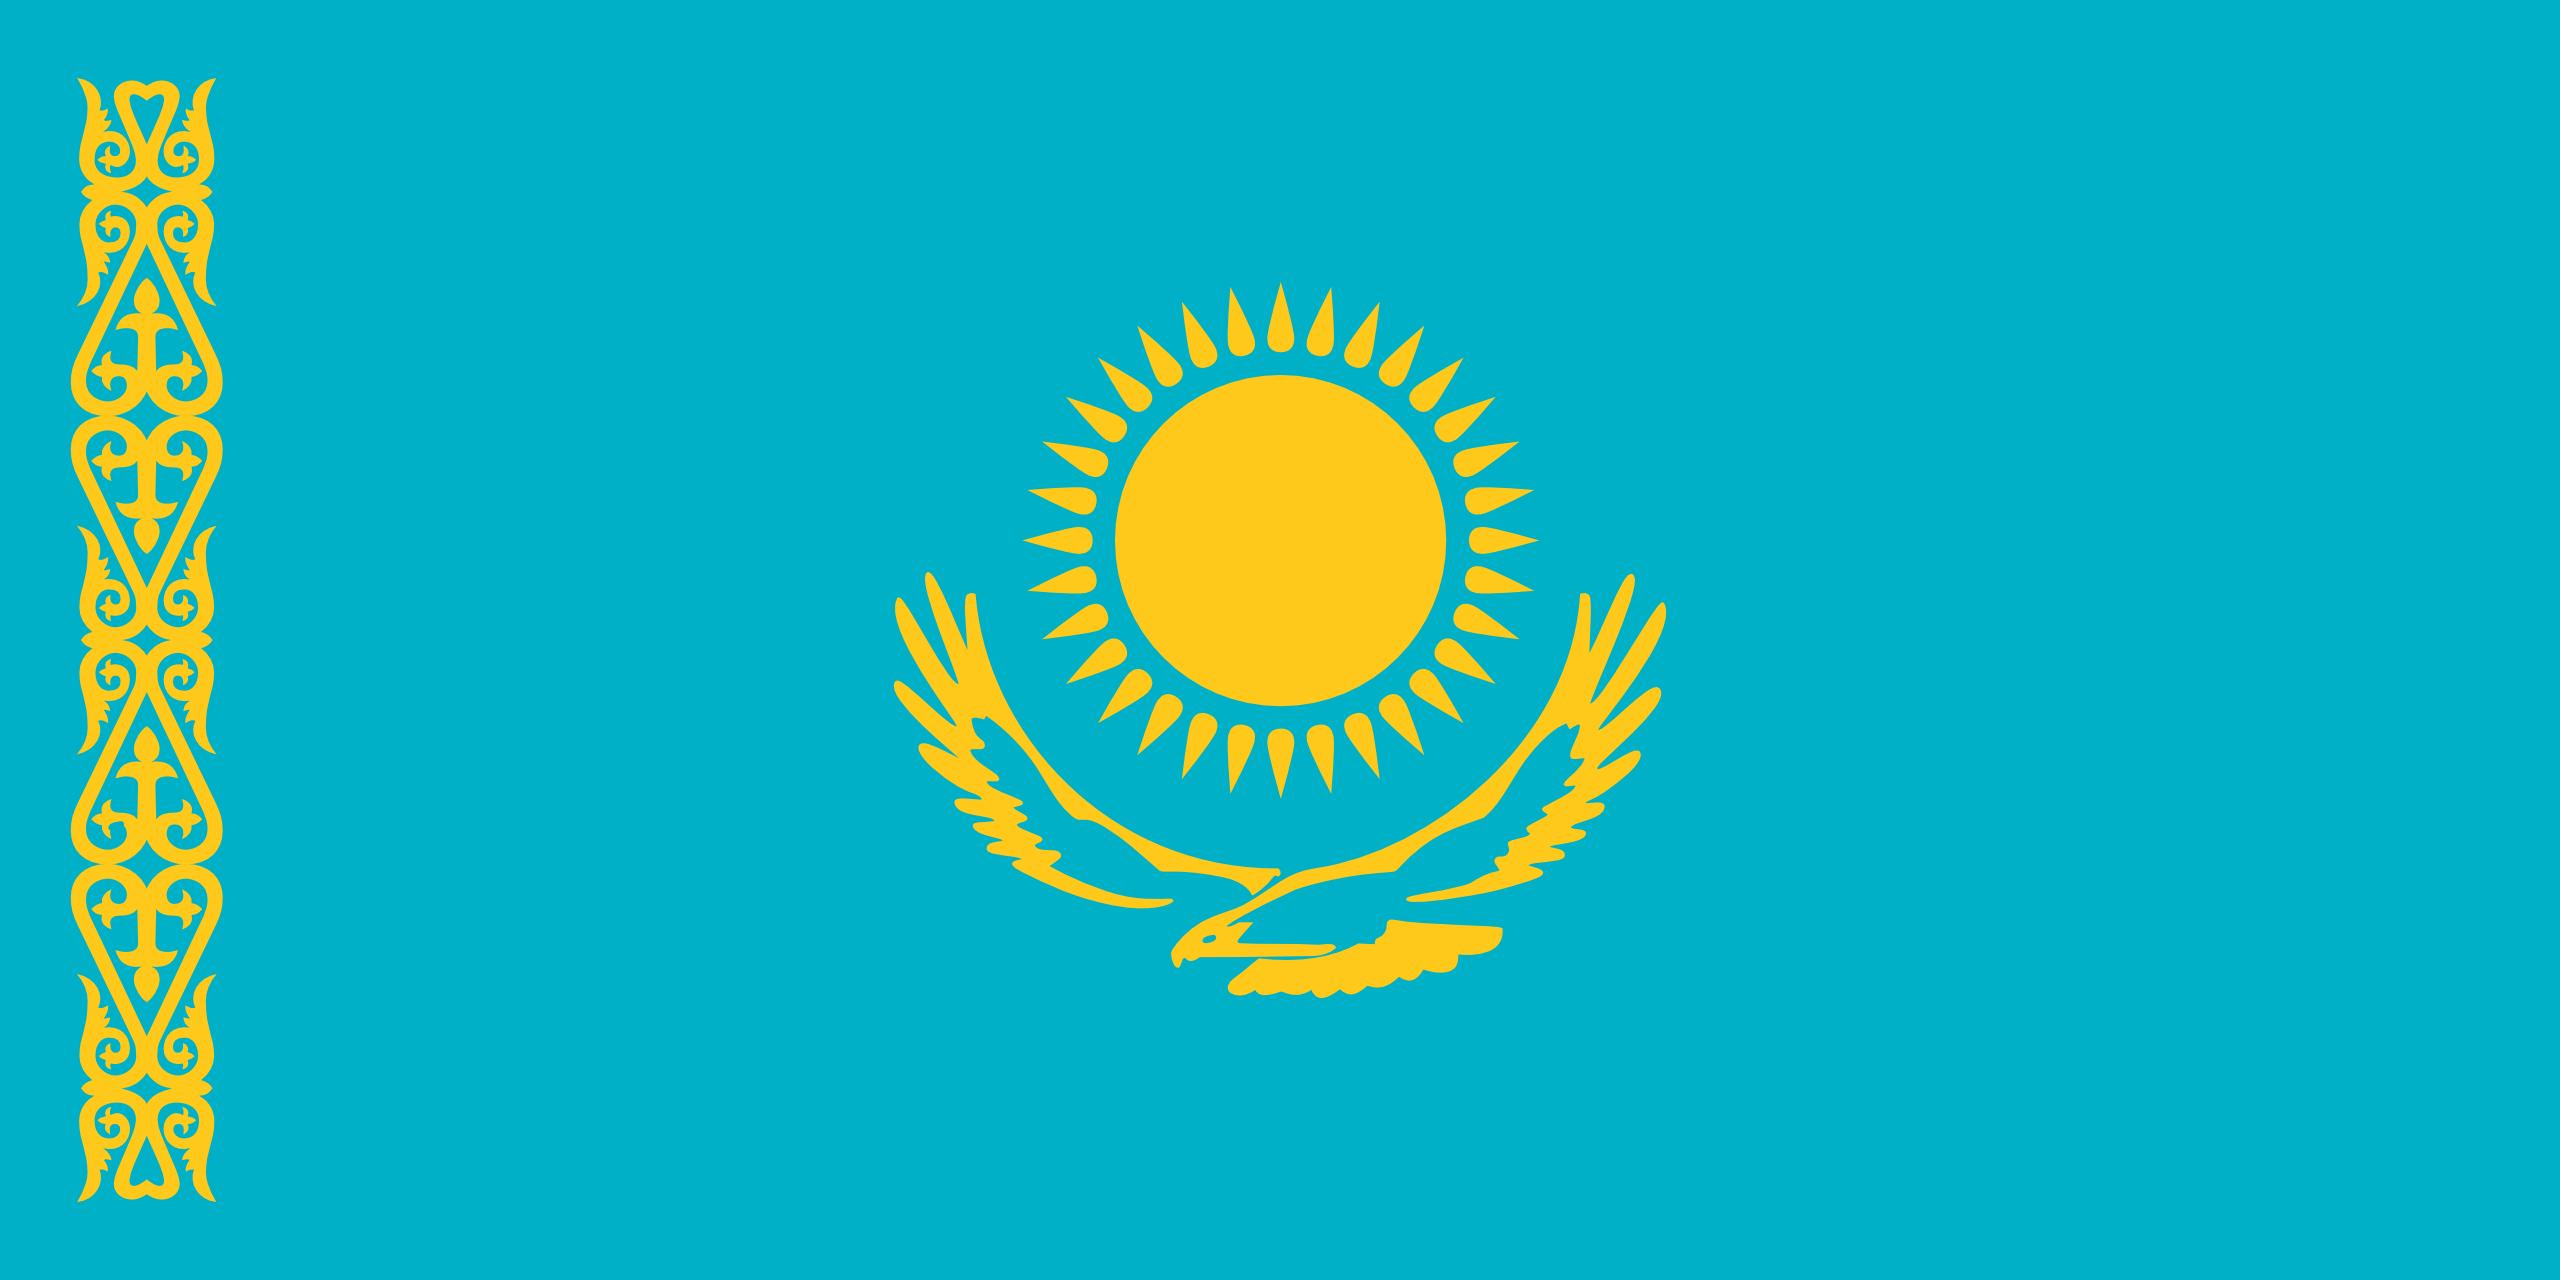 kazajistán, país, emblema, insignia, シンボル - HD の壁紙 - 教授-falken.com